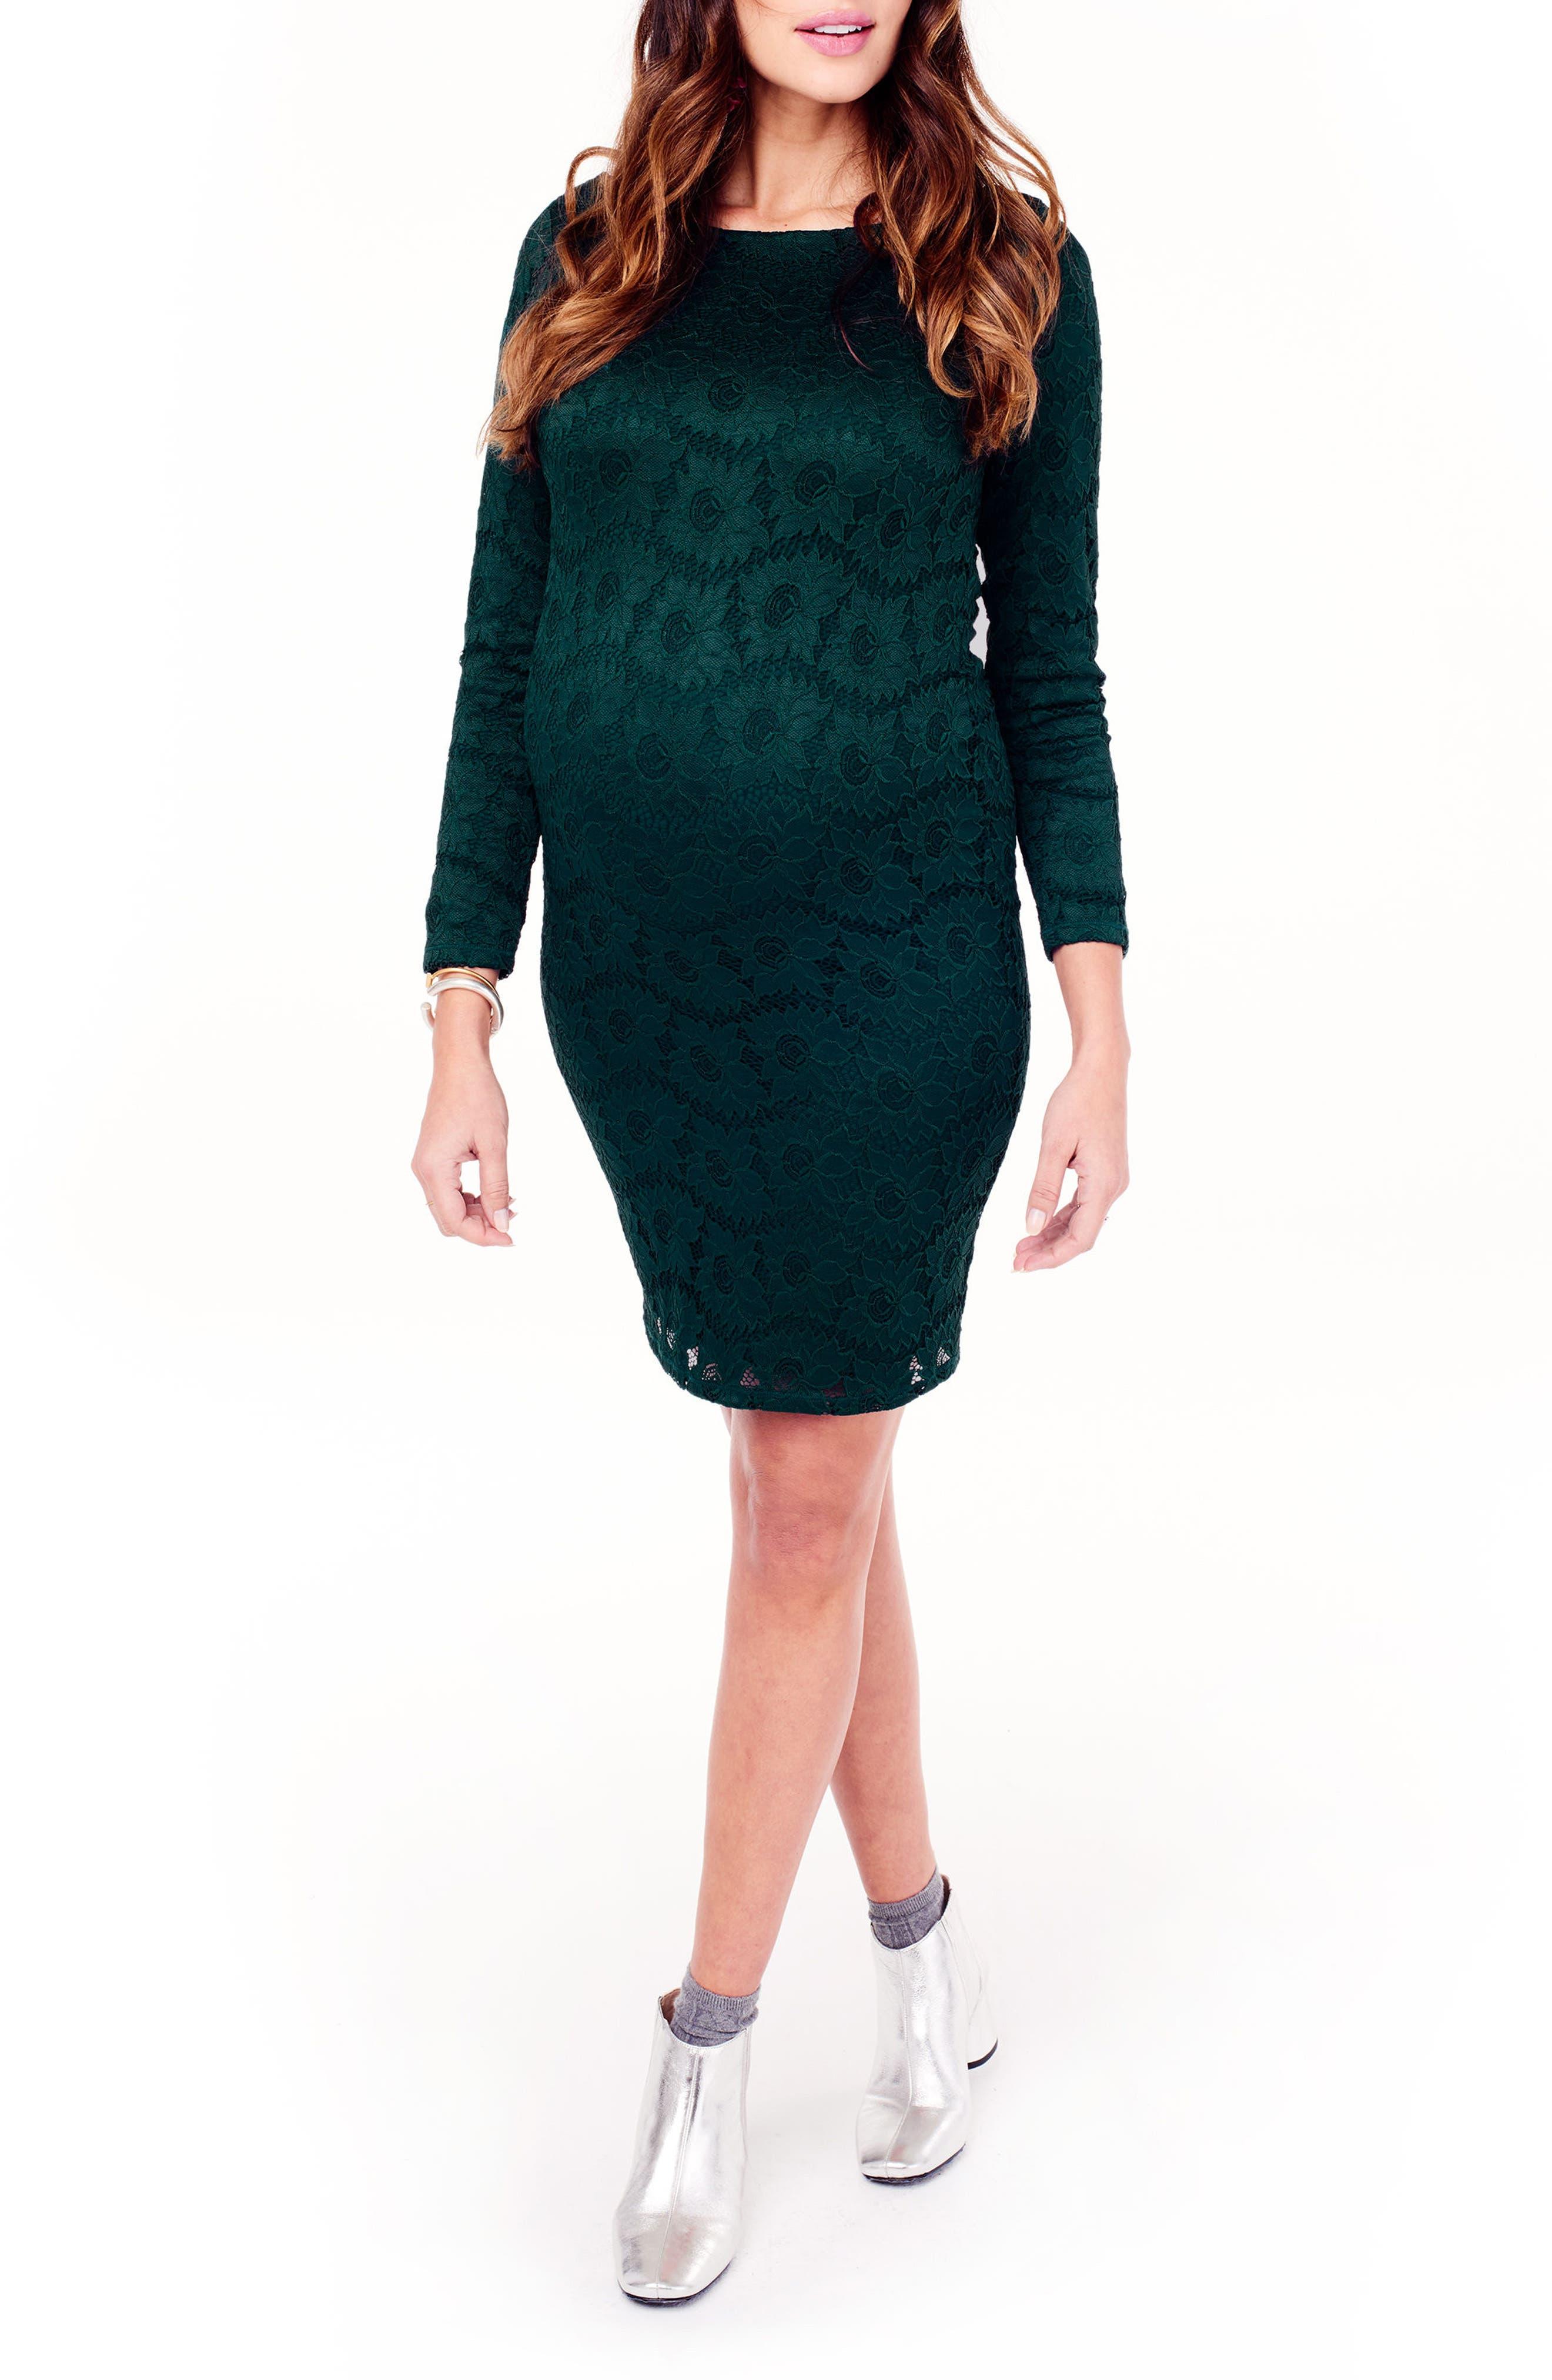 Alternate Image 1 Selected - Ingrid & Isabel Lace Maternity Dress